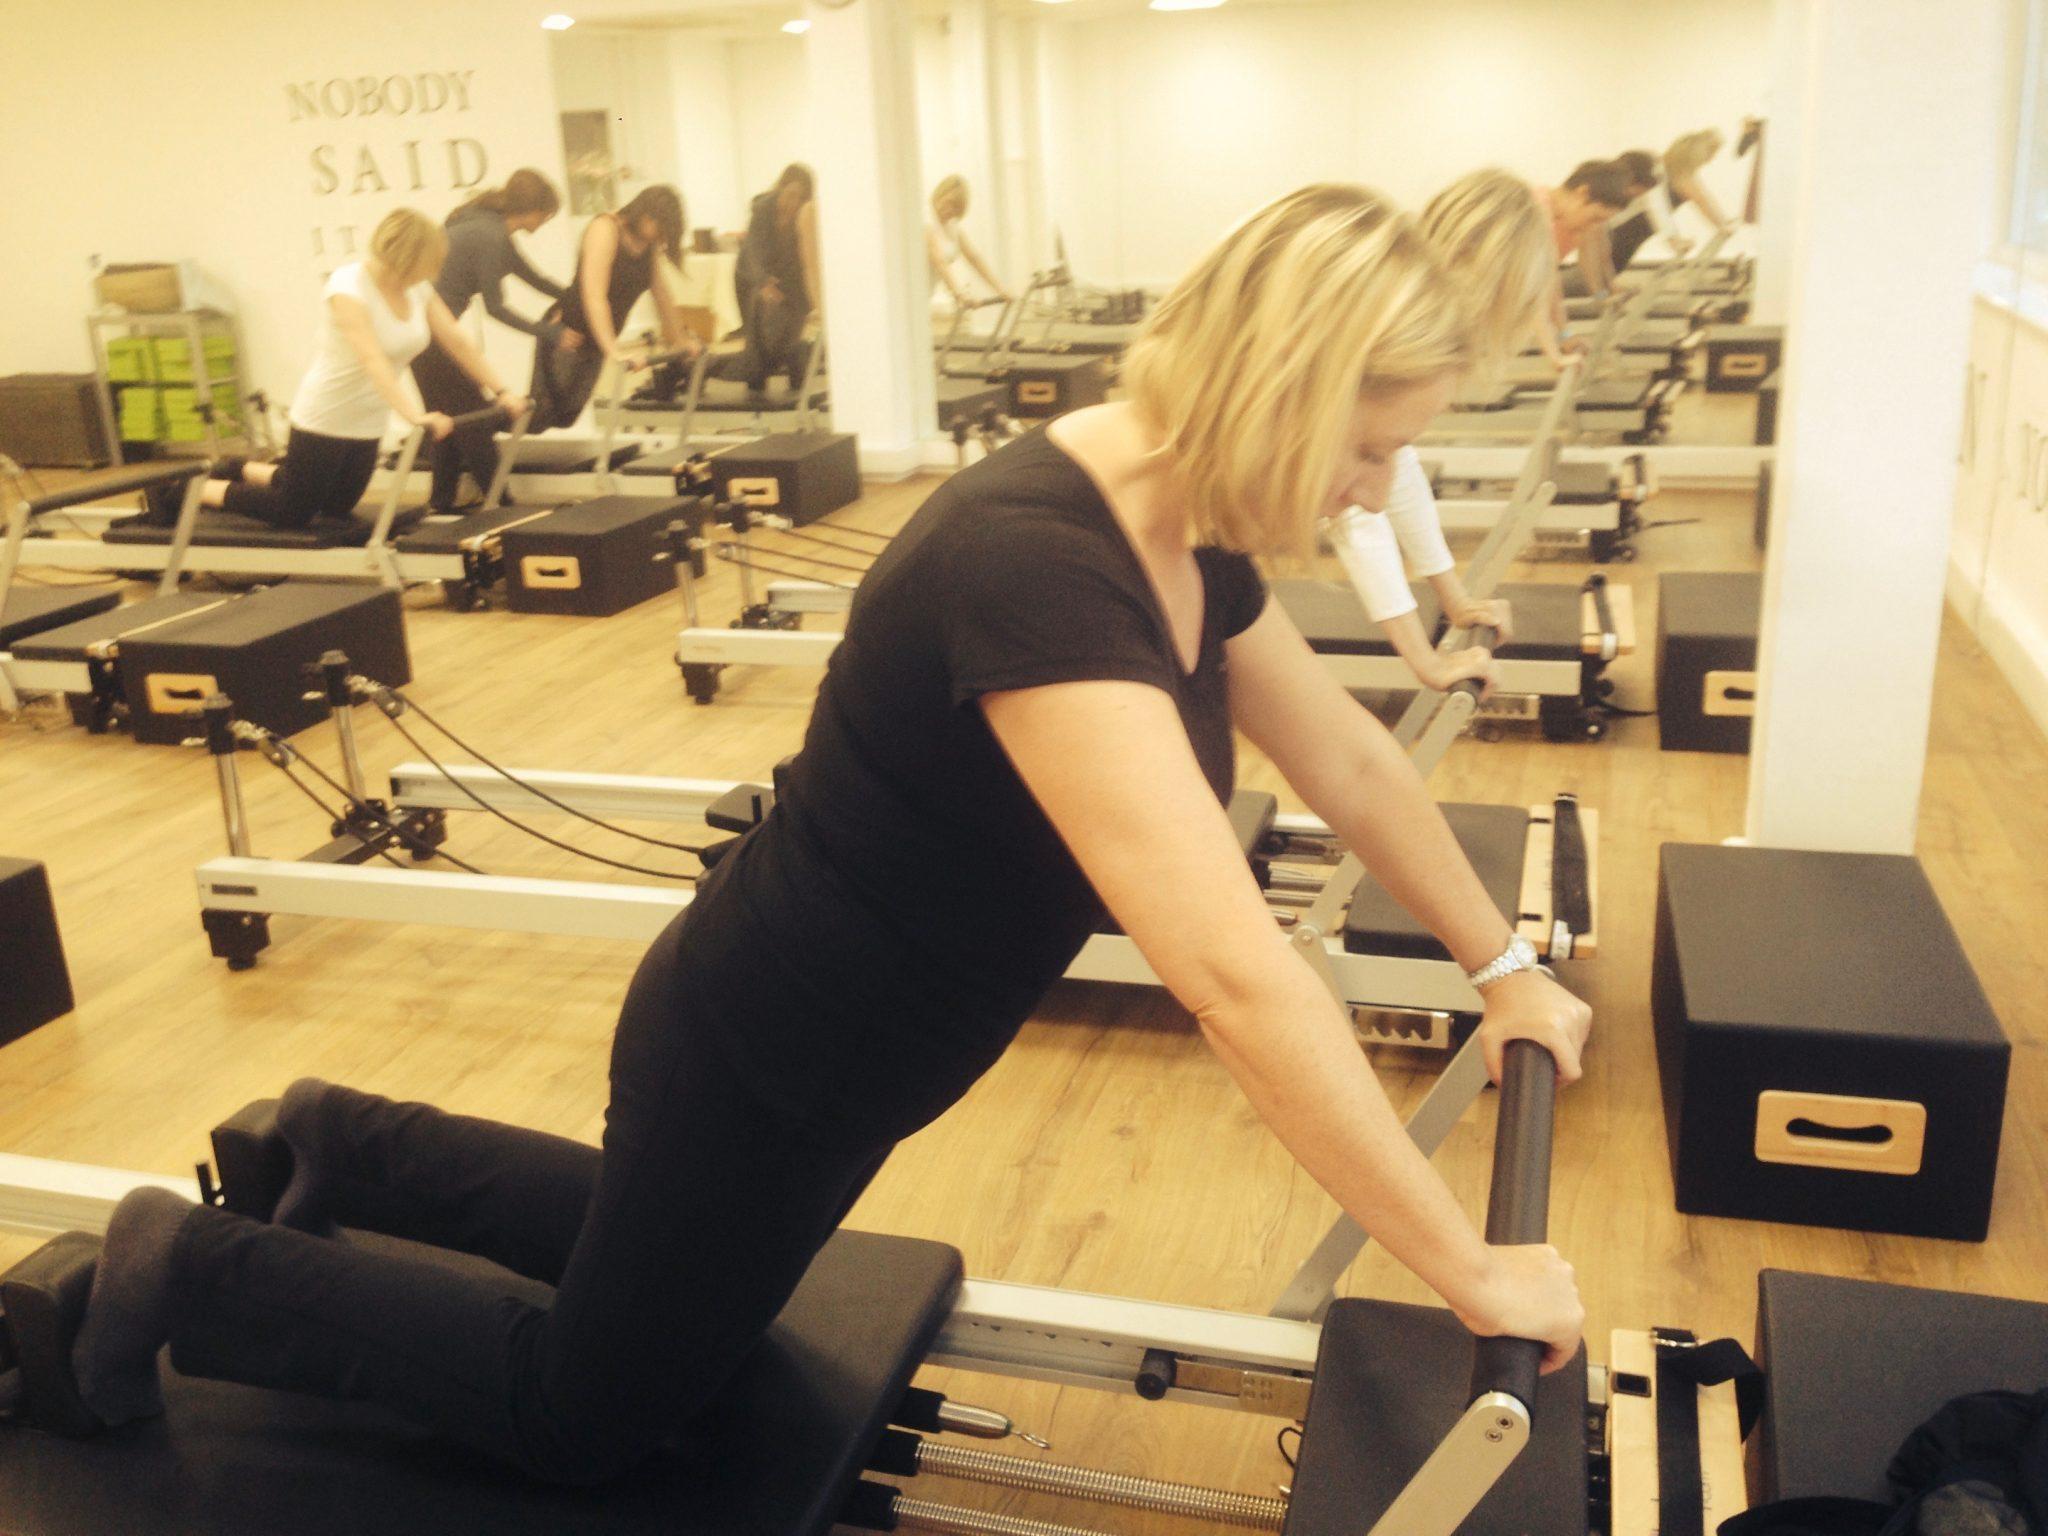 CONTOUR Pilates studio – new reformer pilates studio in Brentwood